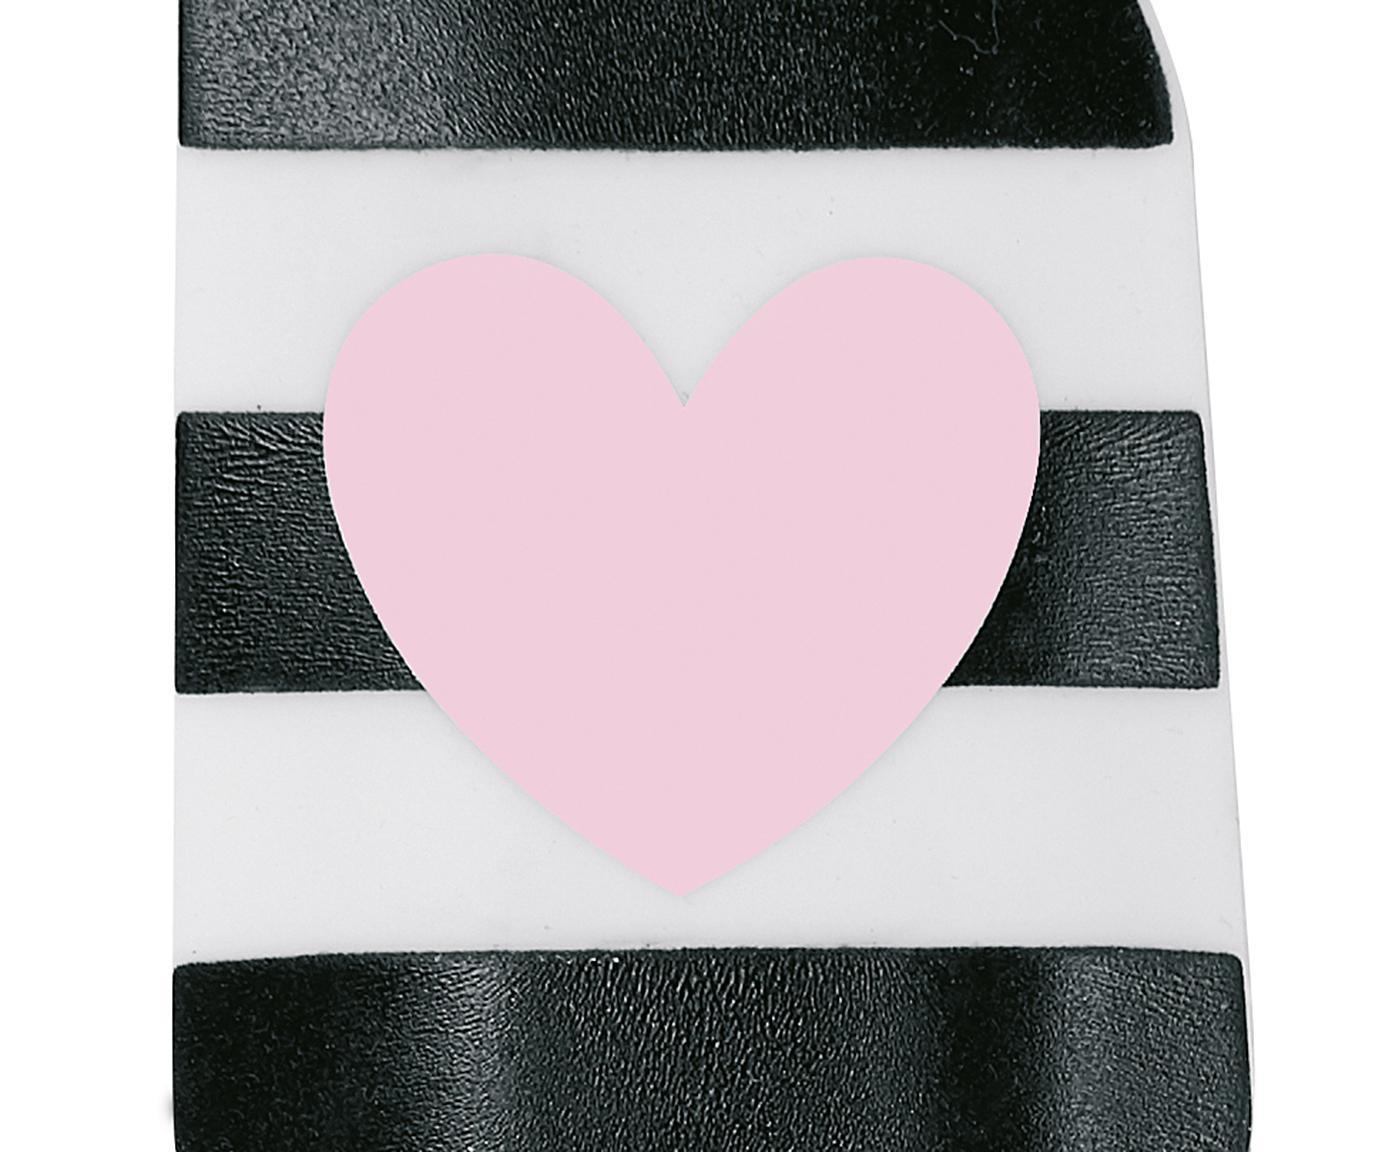 Deegspatel Heart, Silicone, bamboehout, Bamboehoutkleurig, roze, wit, zwart, L 25 cm